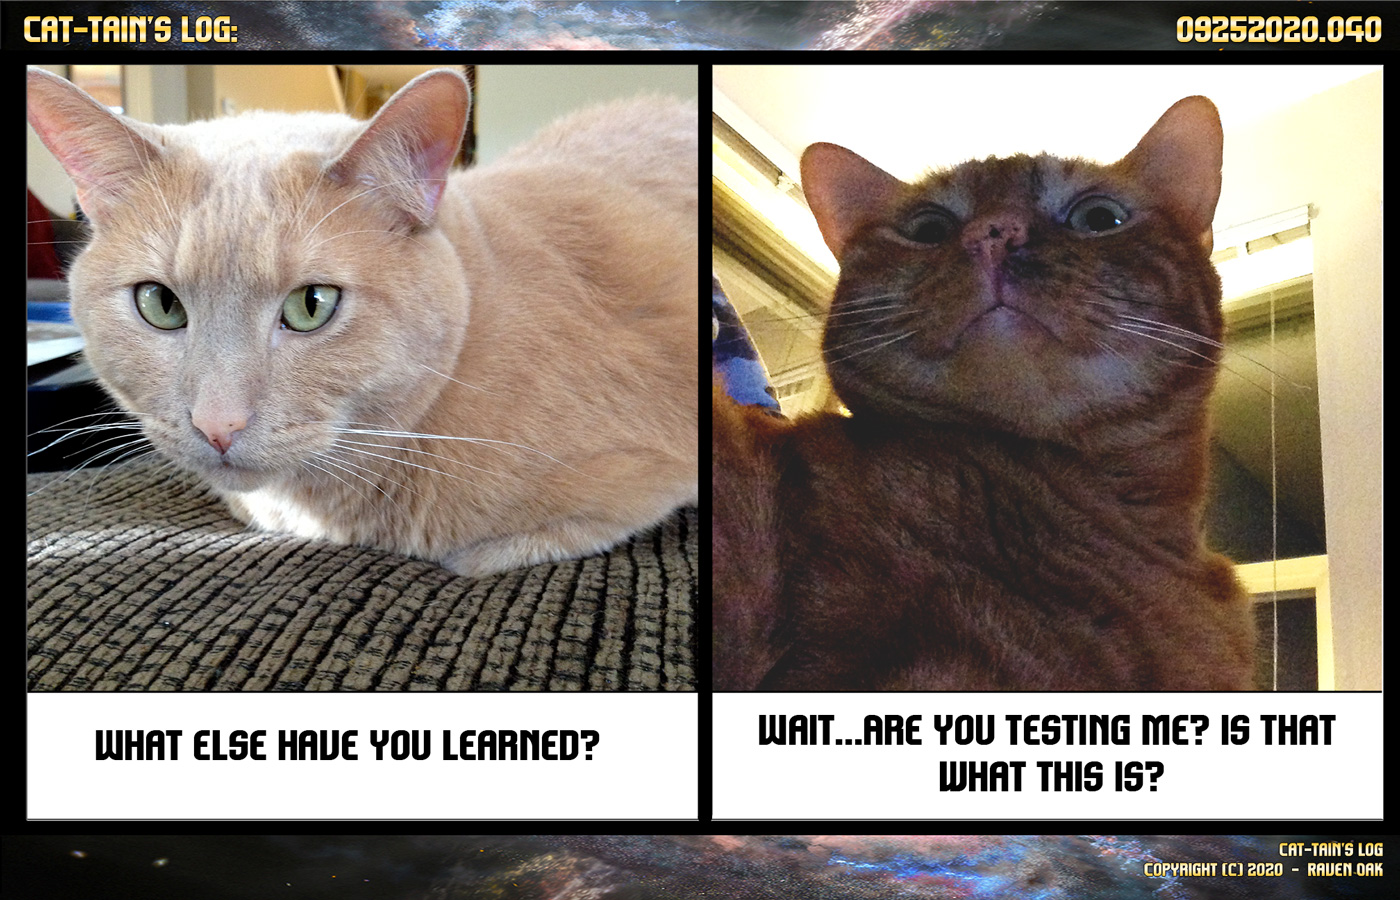 cat-tain's log episode 040